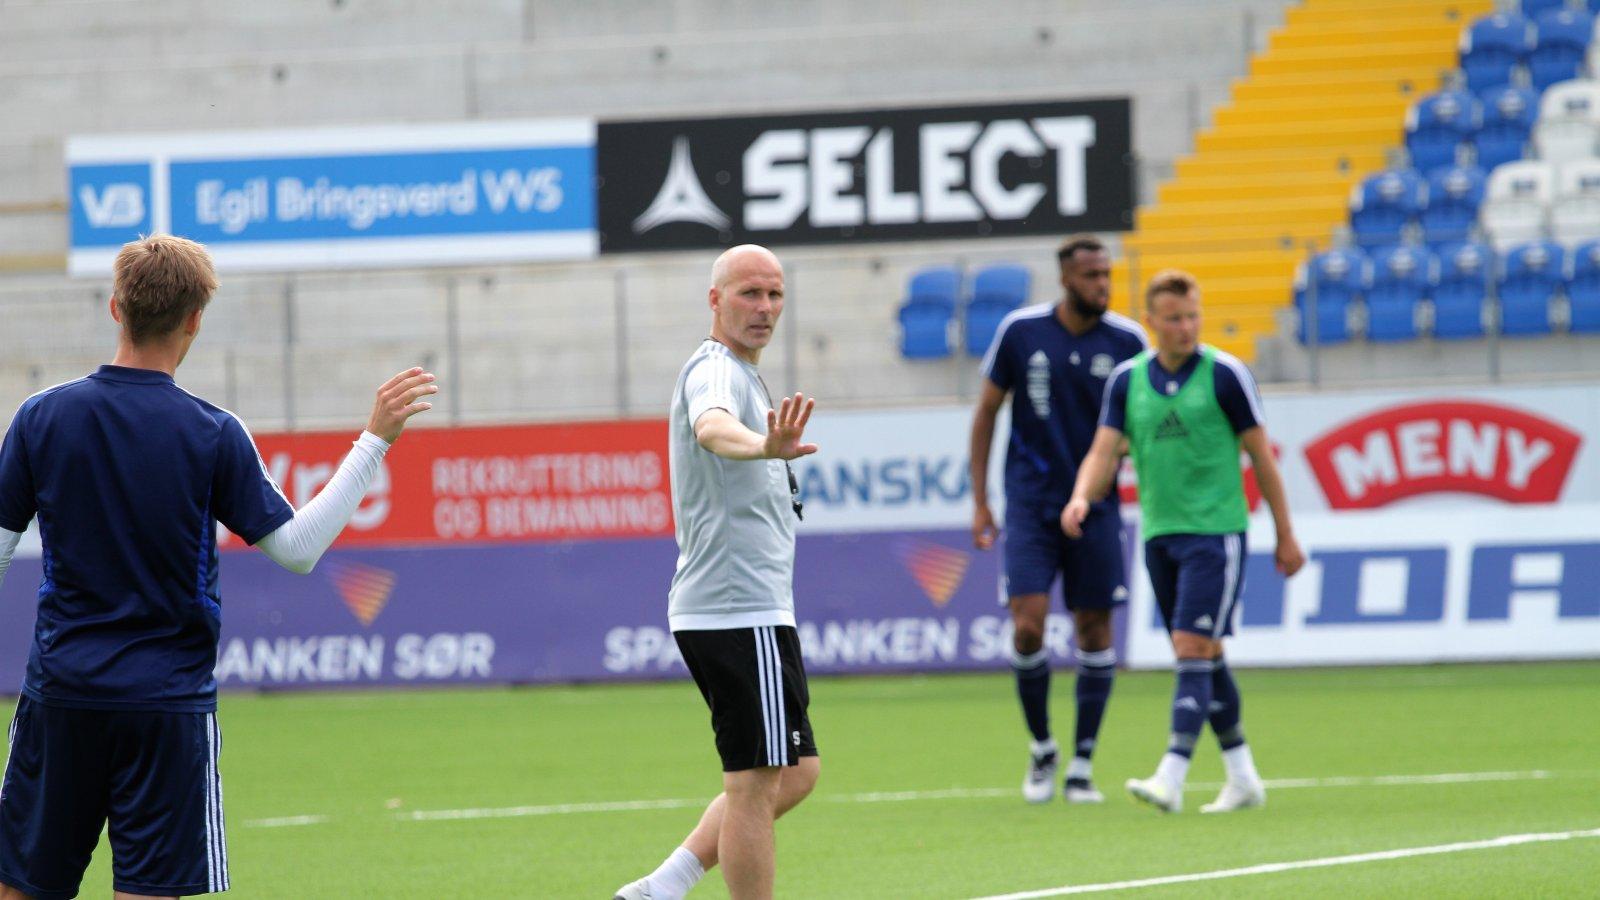 Steinar Pedersen på trening foran kampen mot Kvik Halden.